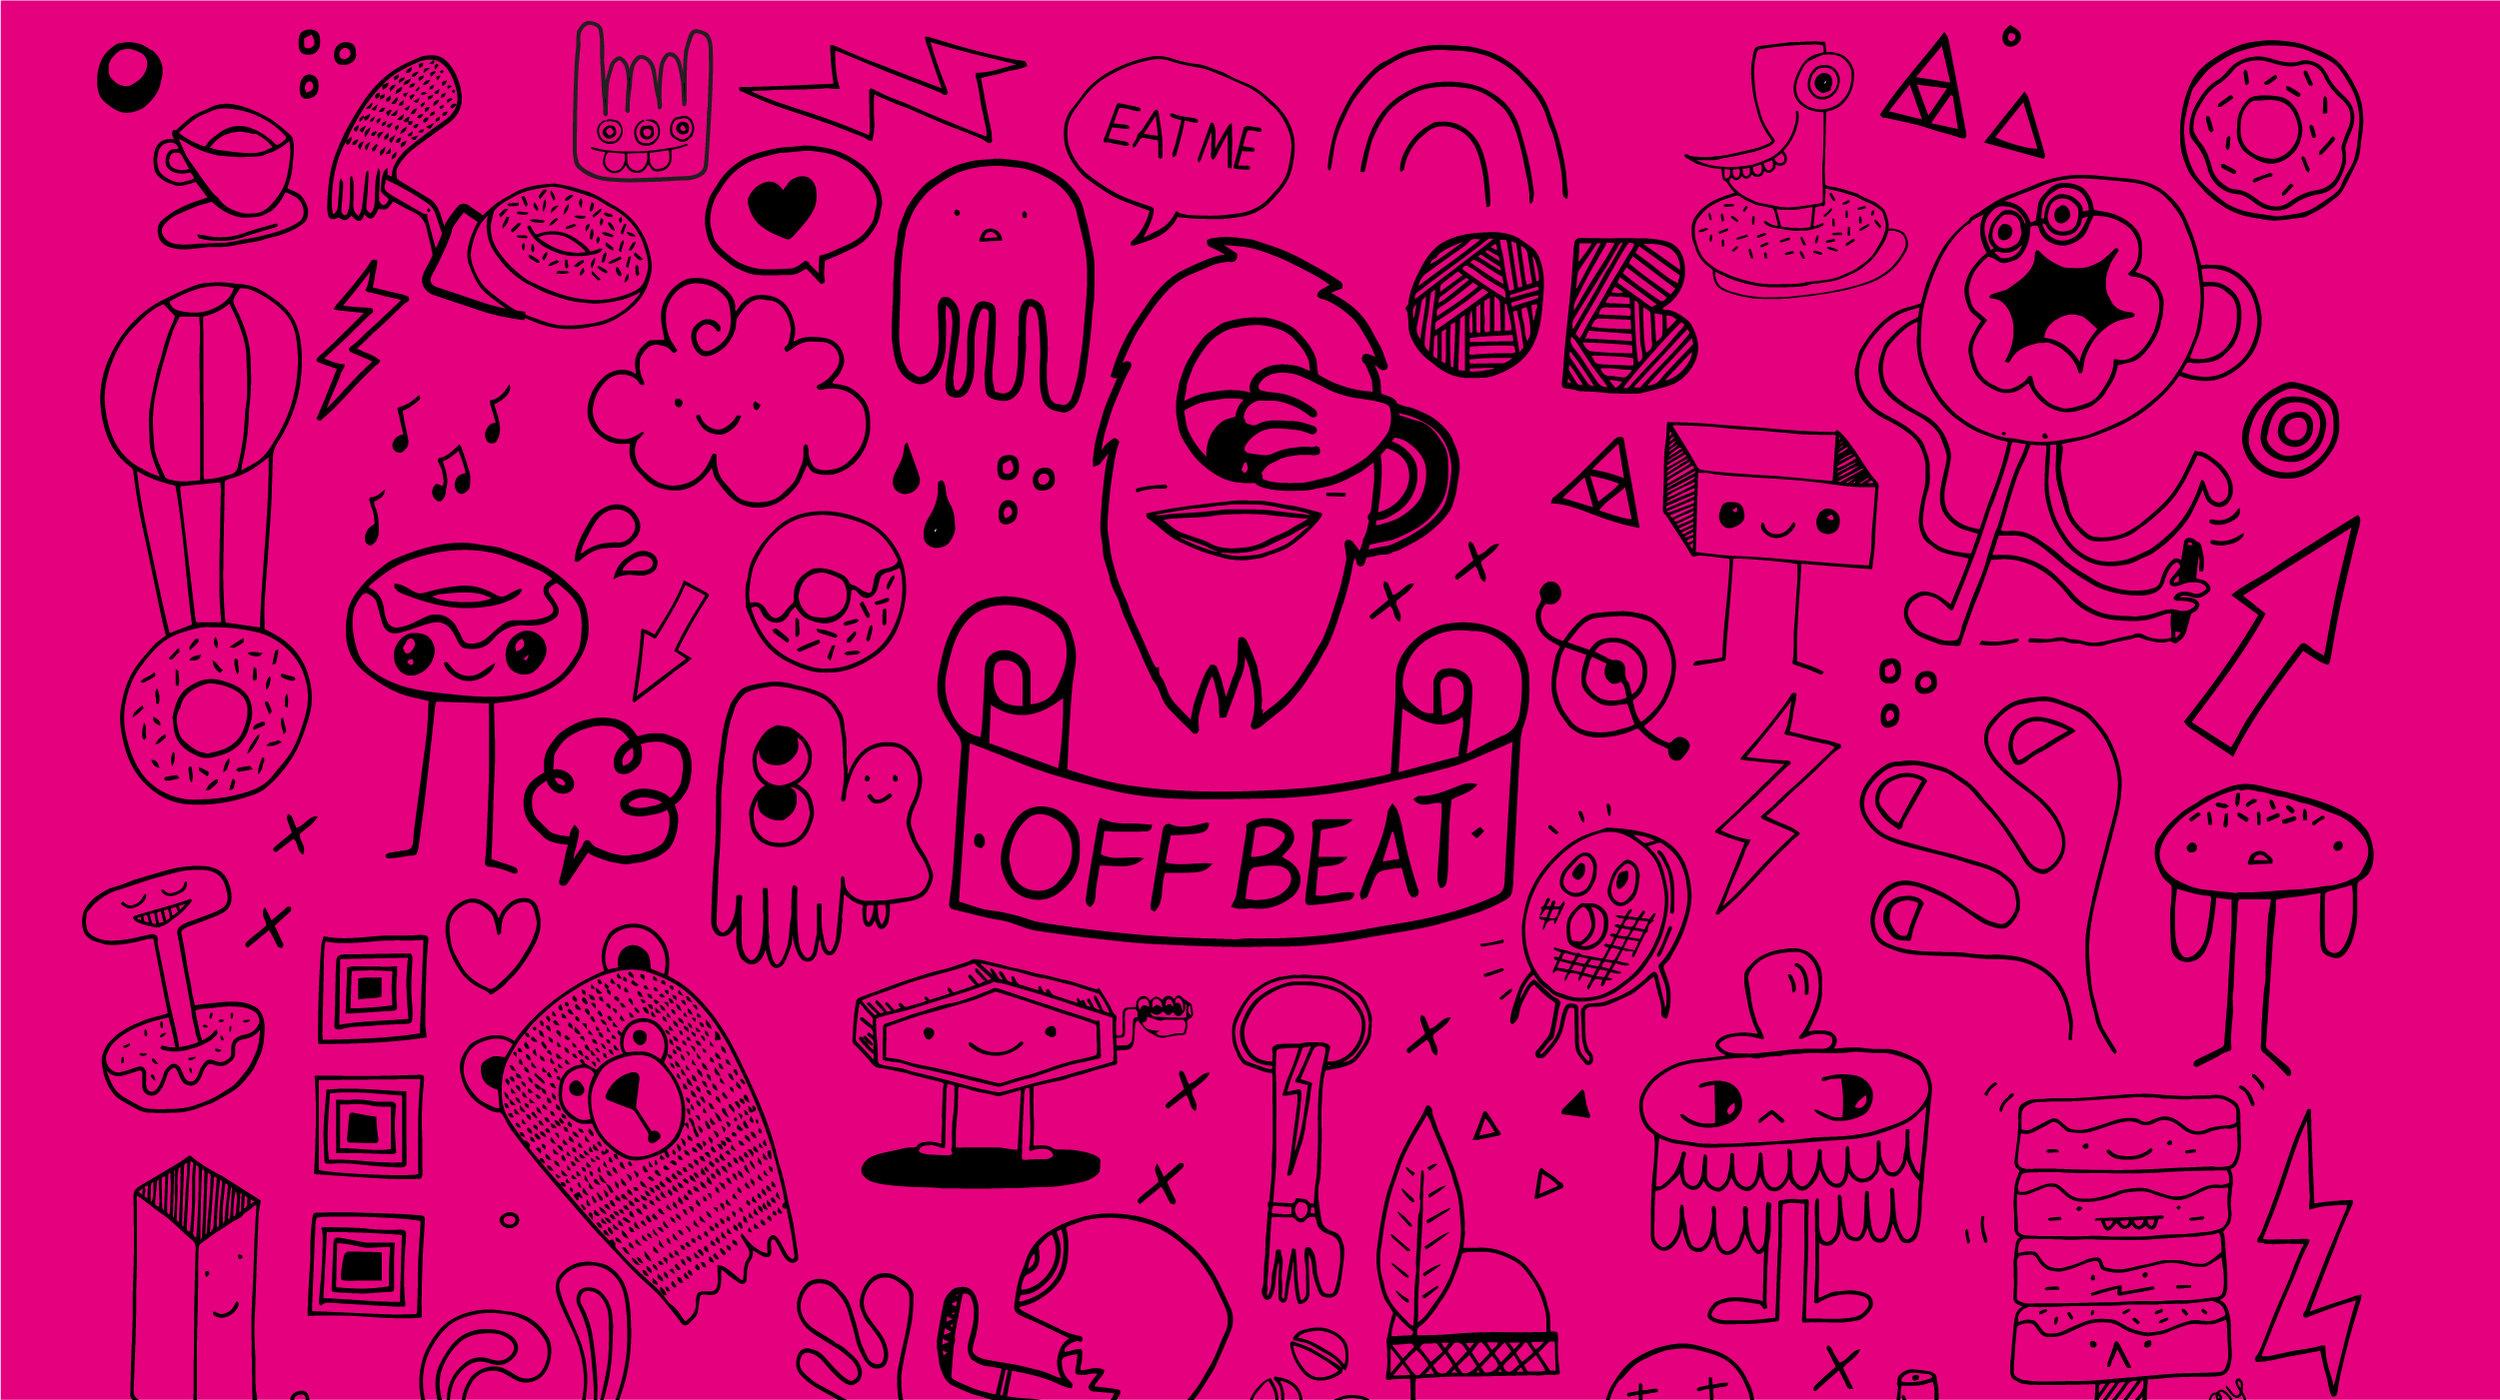 LMPP Offbeat Donuts Illustrations.jpg